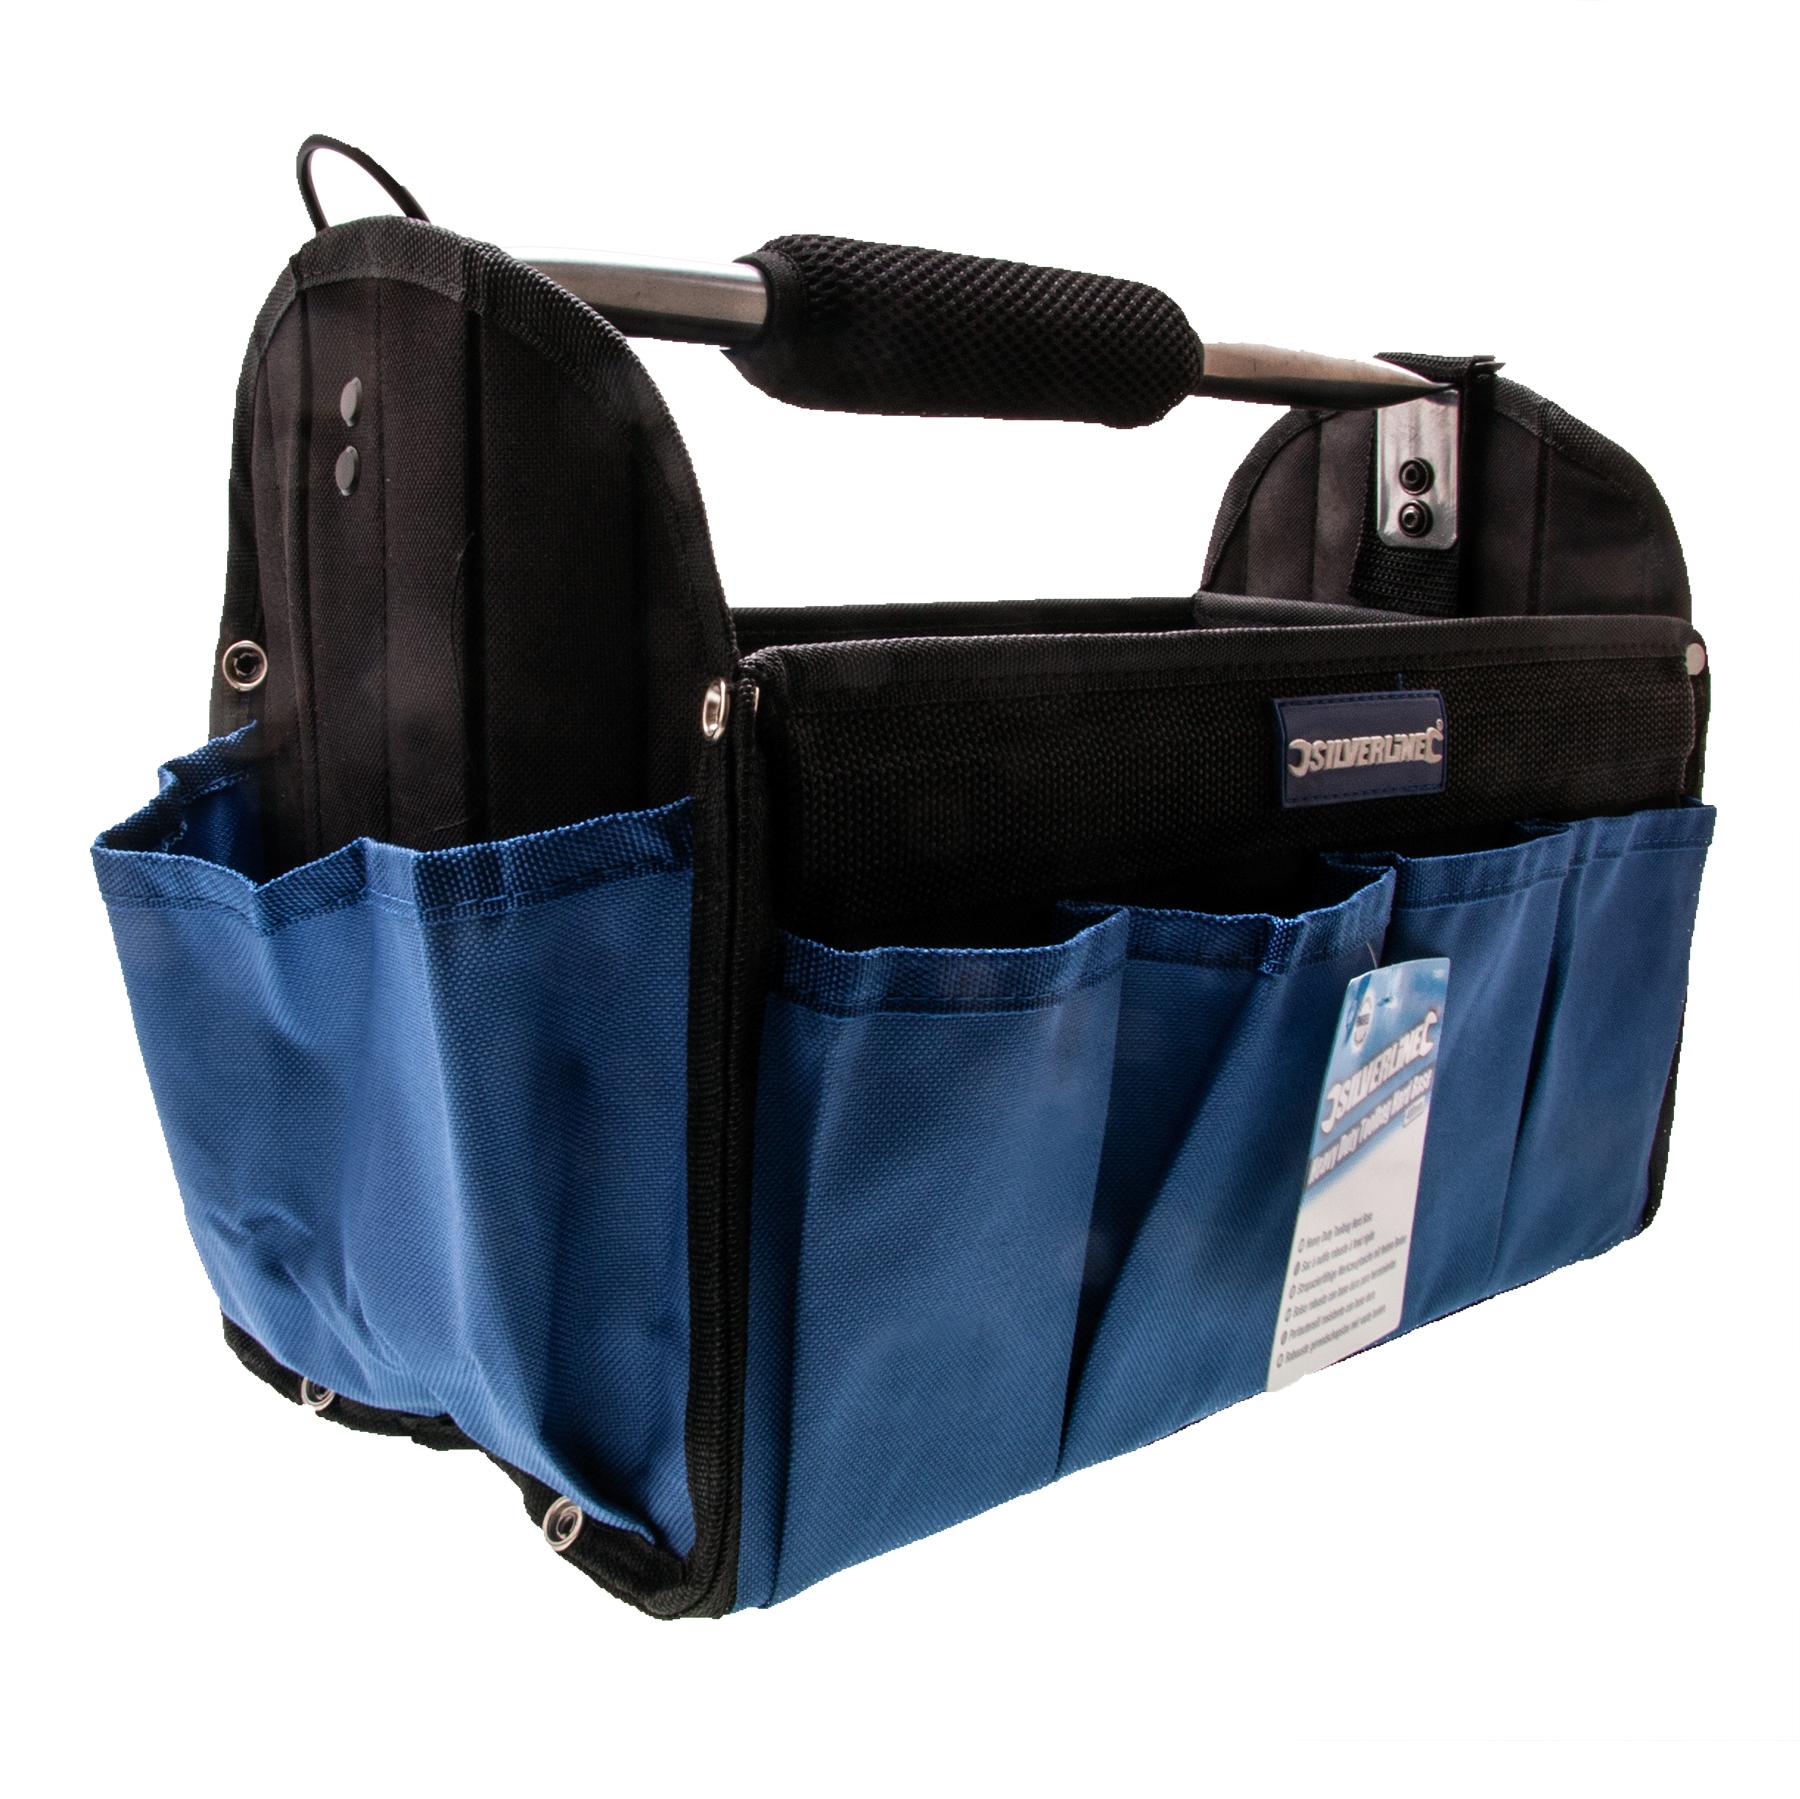 HEAVY DUTY HARD BASE TOOL BAG SHOULDER STRAP NEW POCKETS 400 x 200 x 250mm